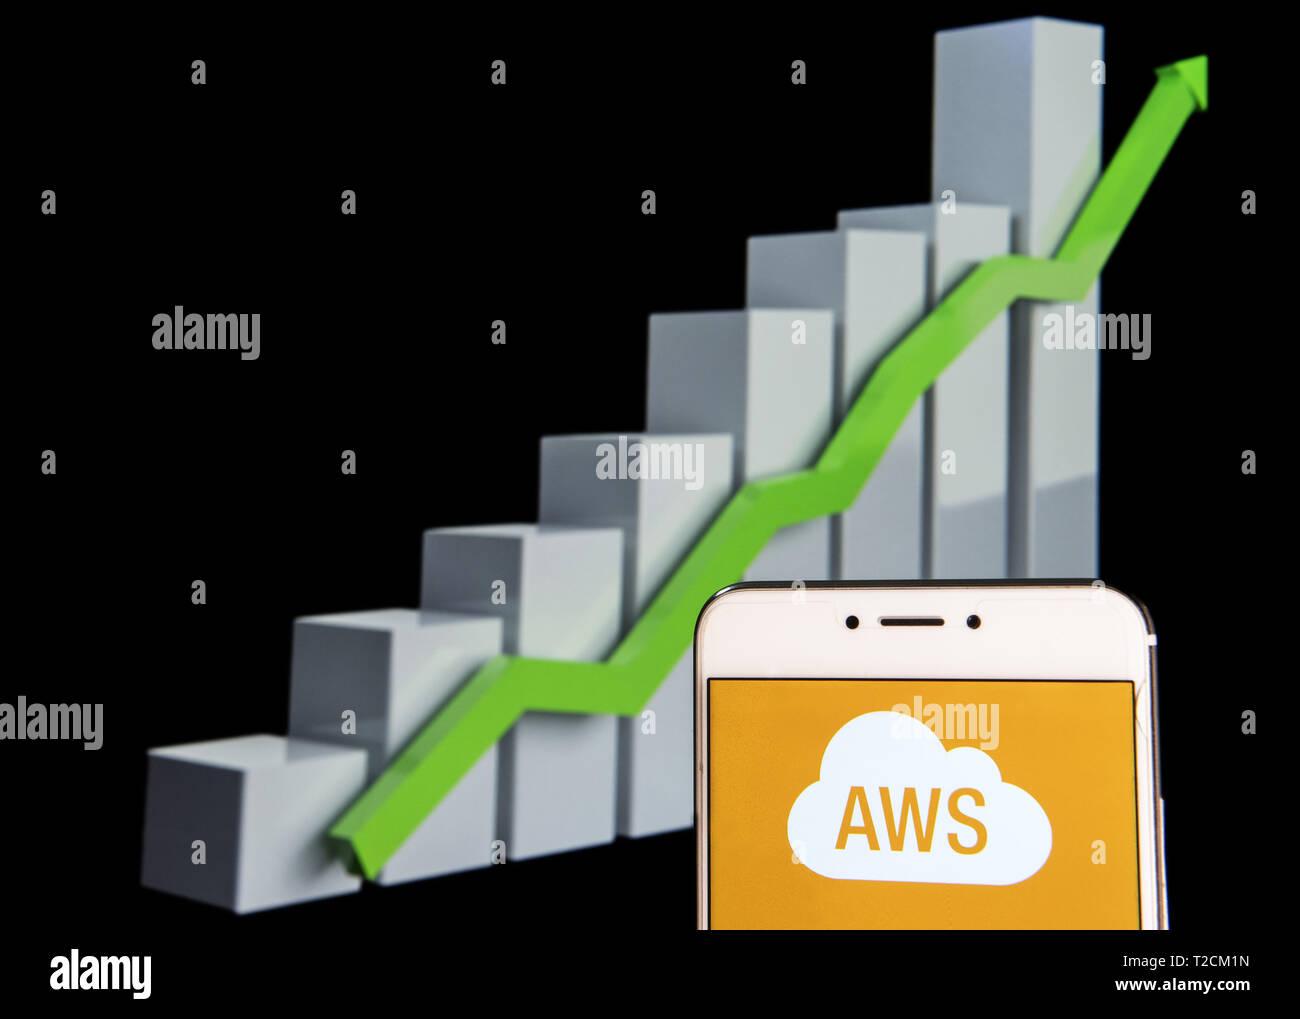 Amazon Web Services Stock Photos & Amazon Web Services Stock Images